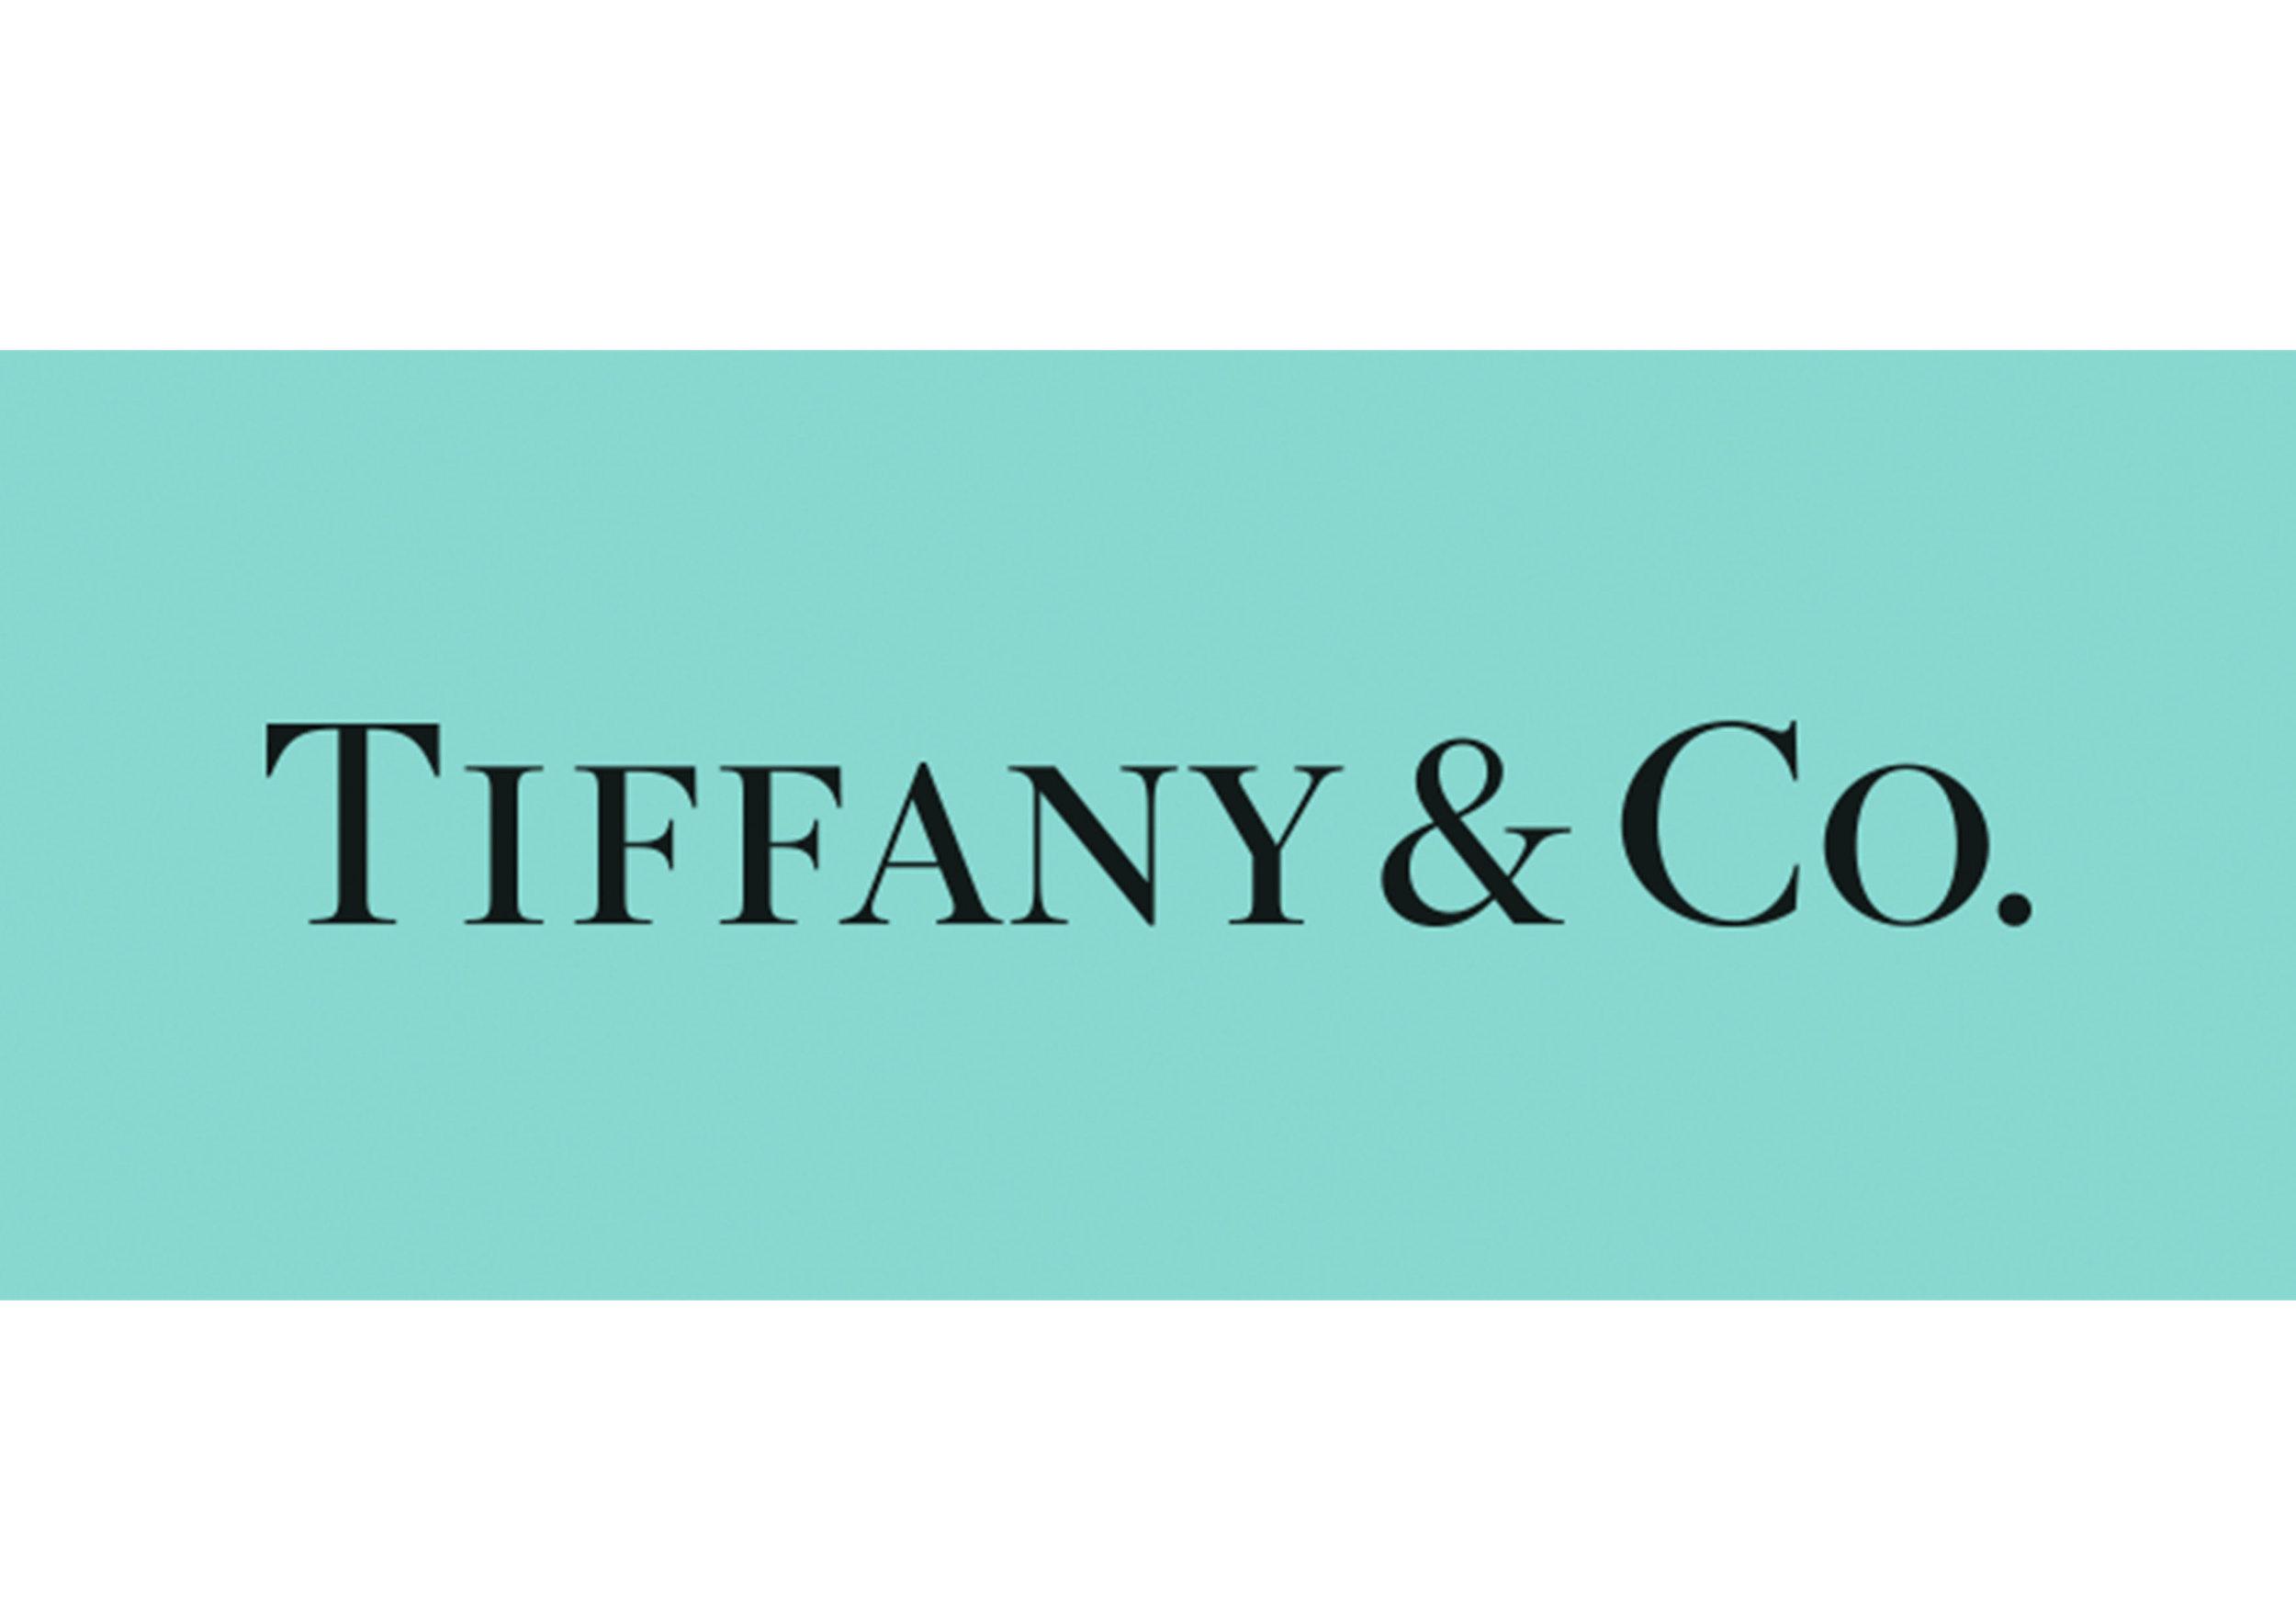 Tiffany & Co.jpg